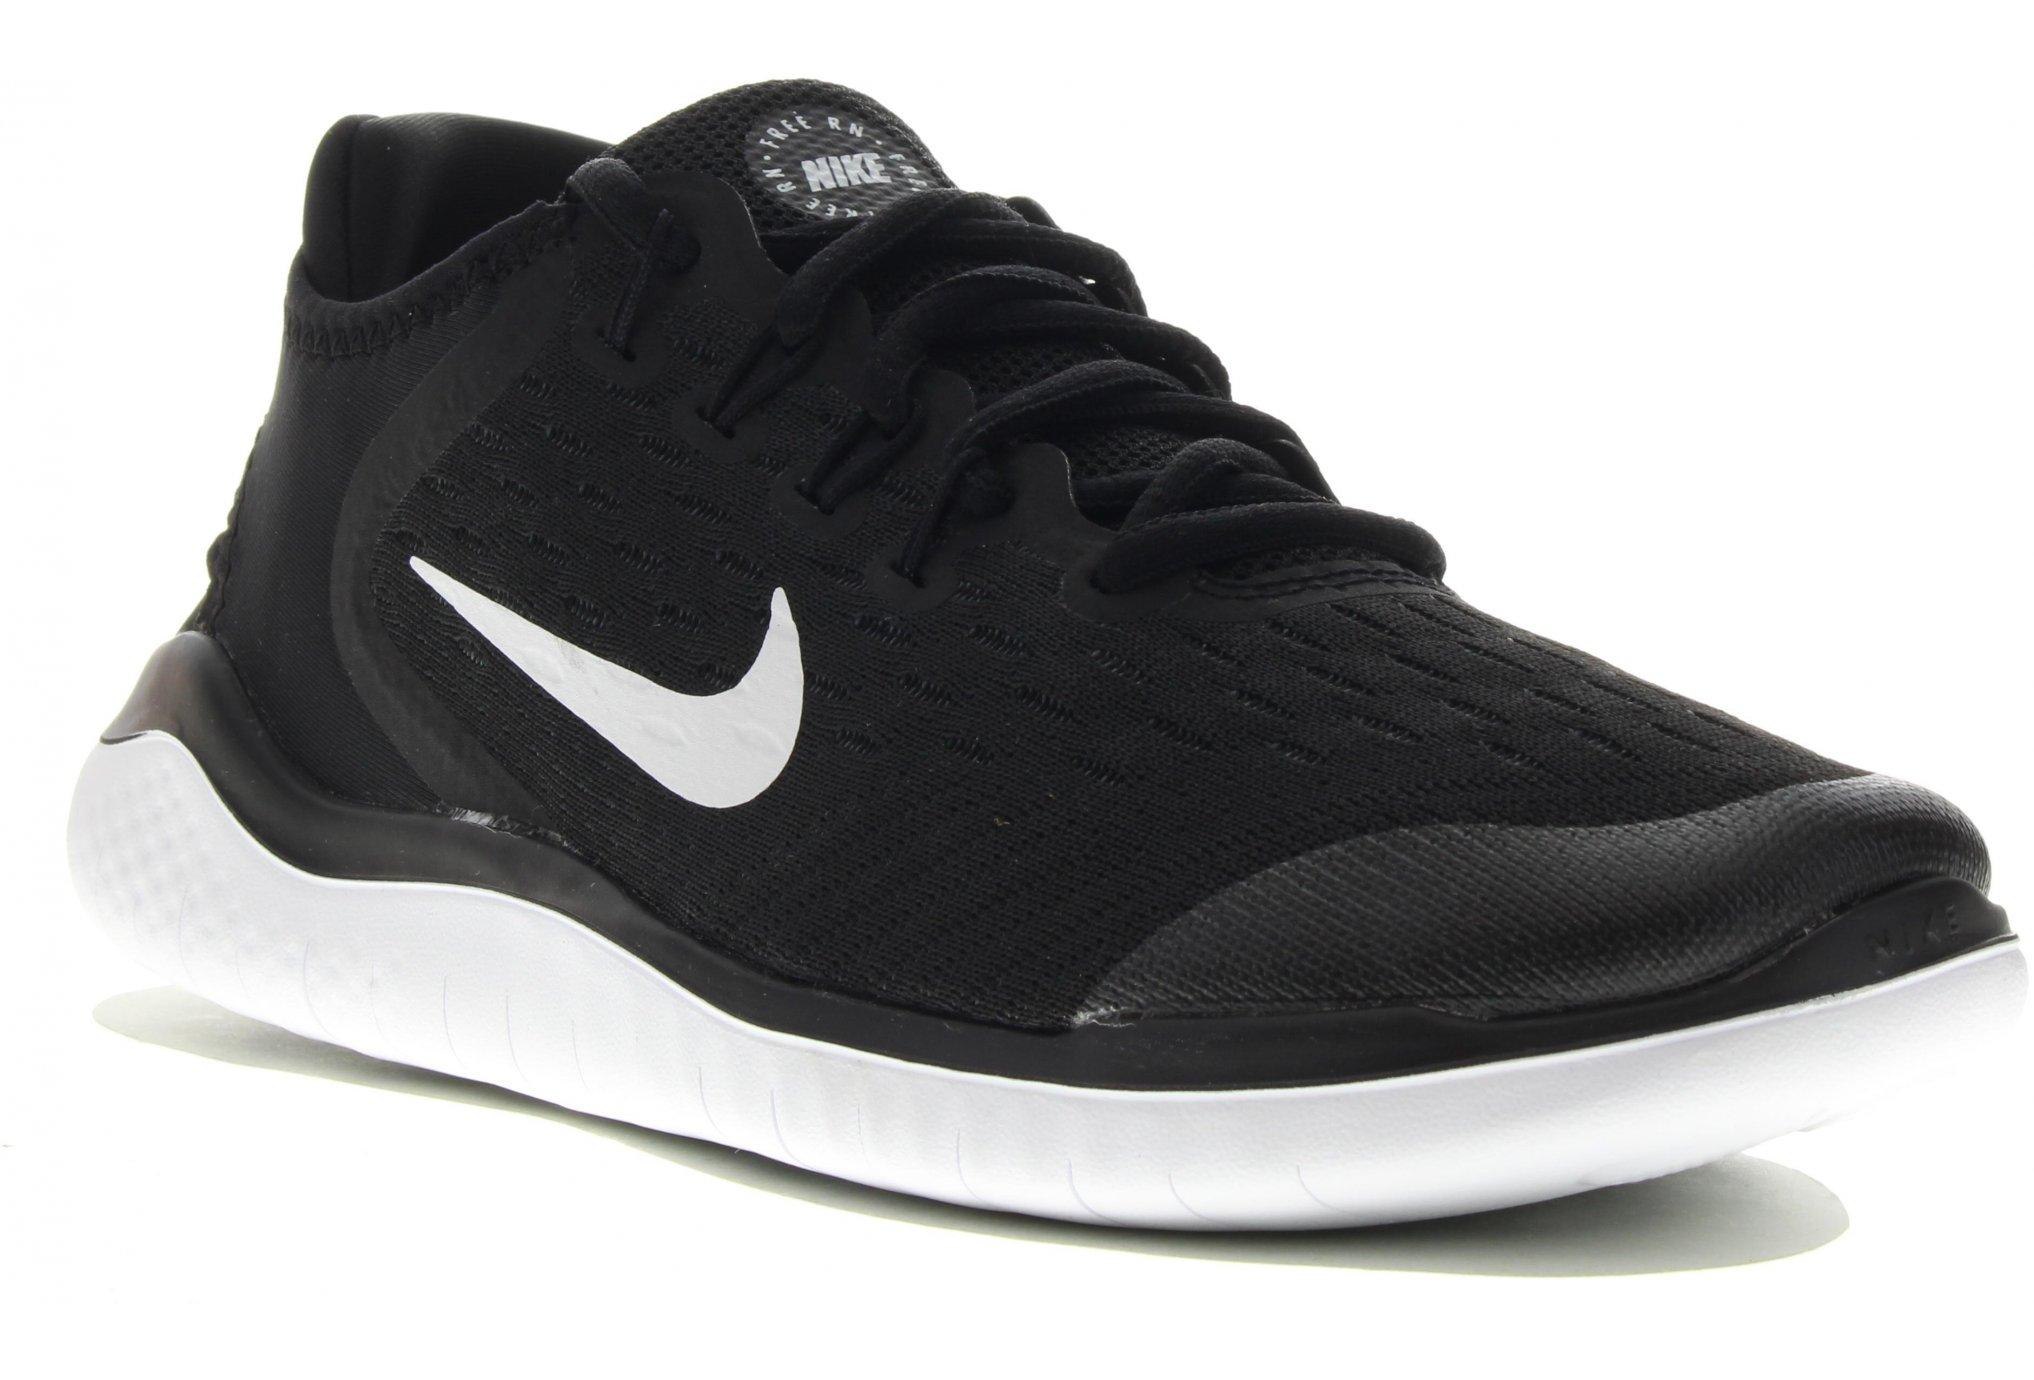 online store f7711 ad585 Nike Free 3.0 V5 M homme Noir pas cher